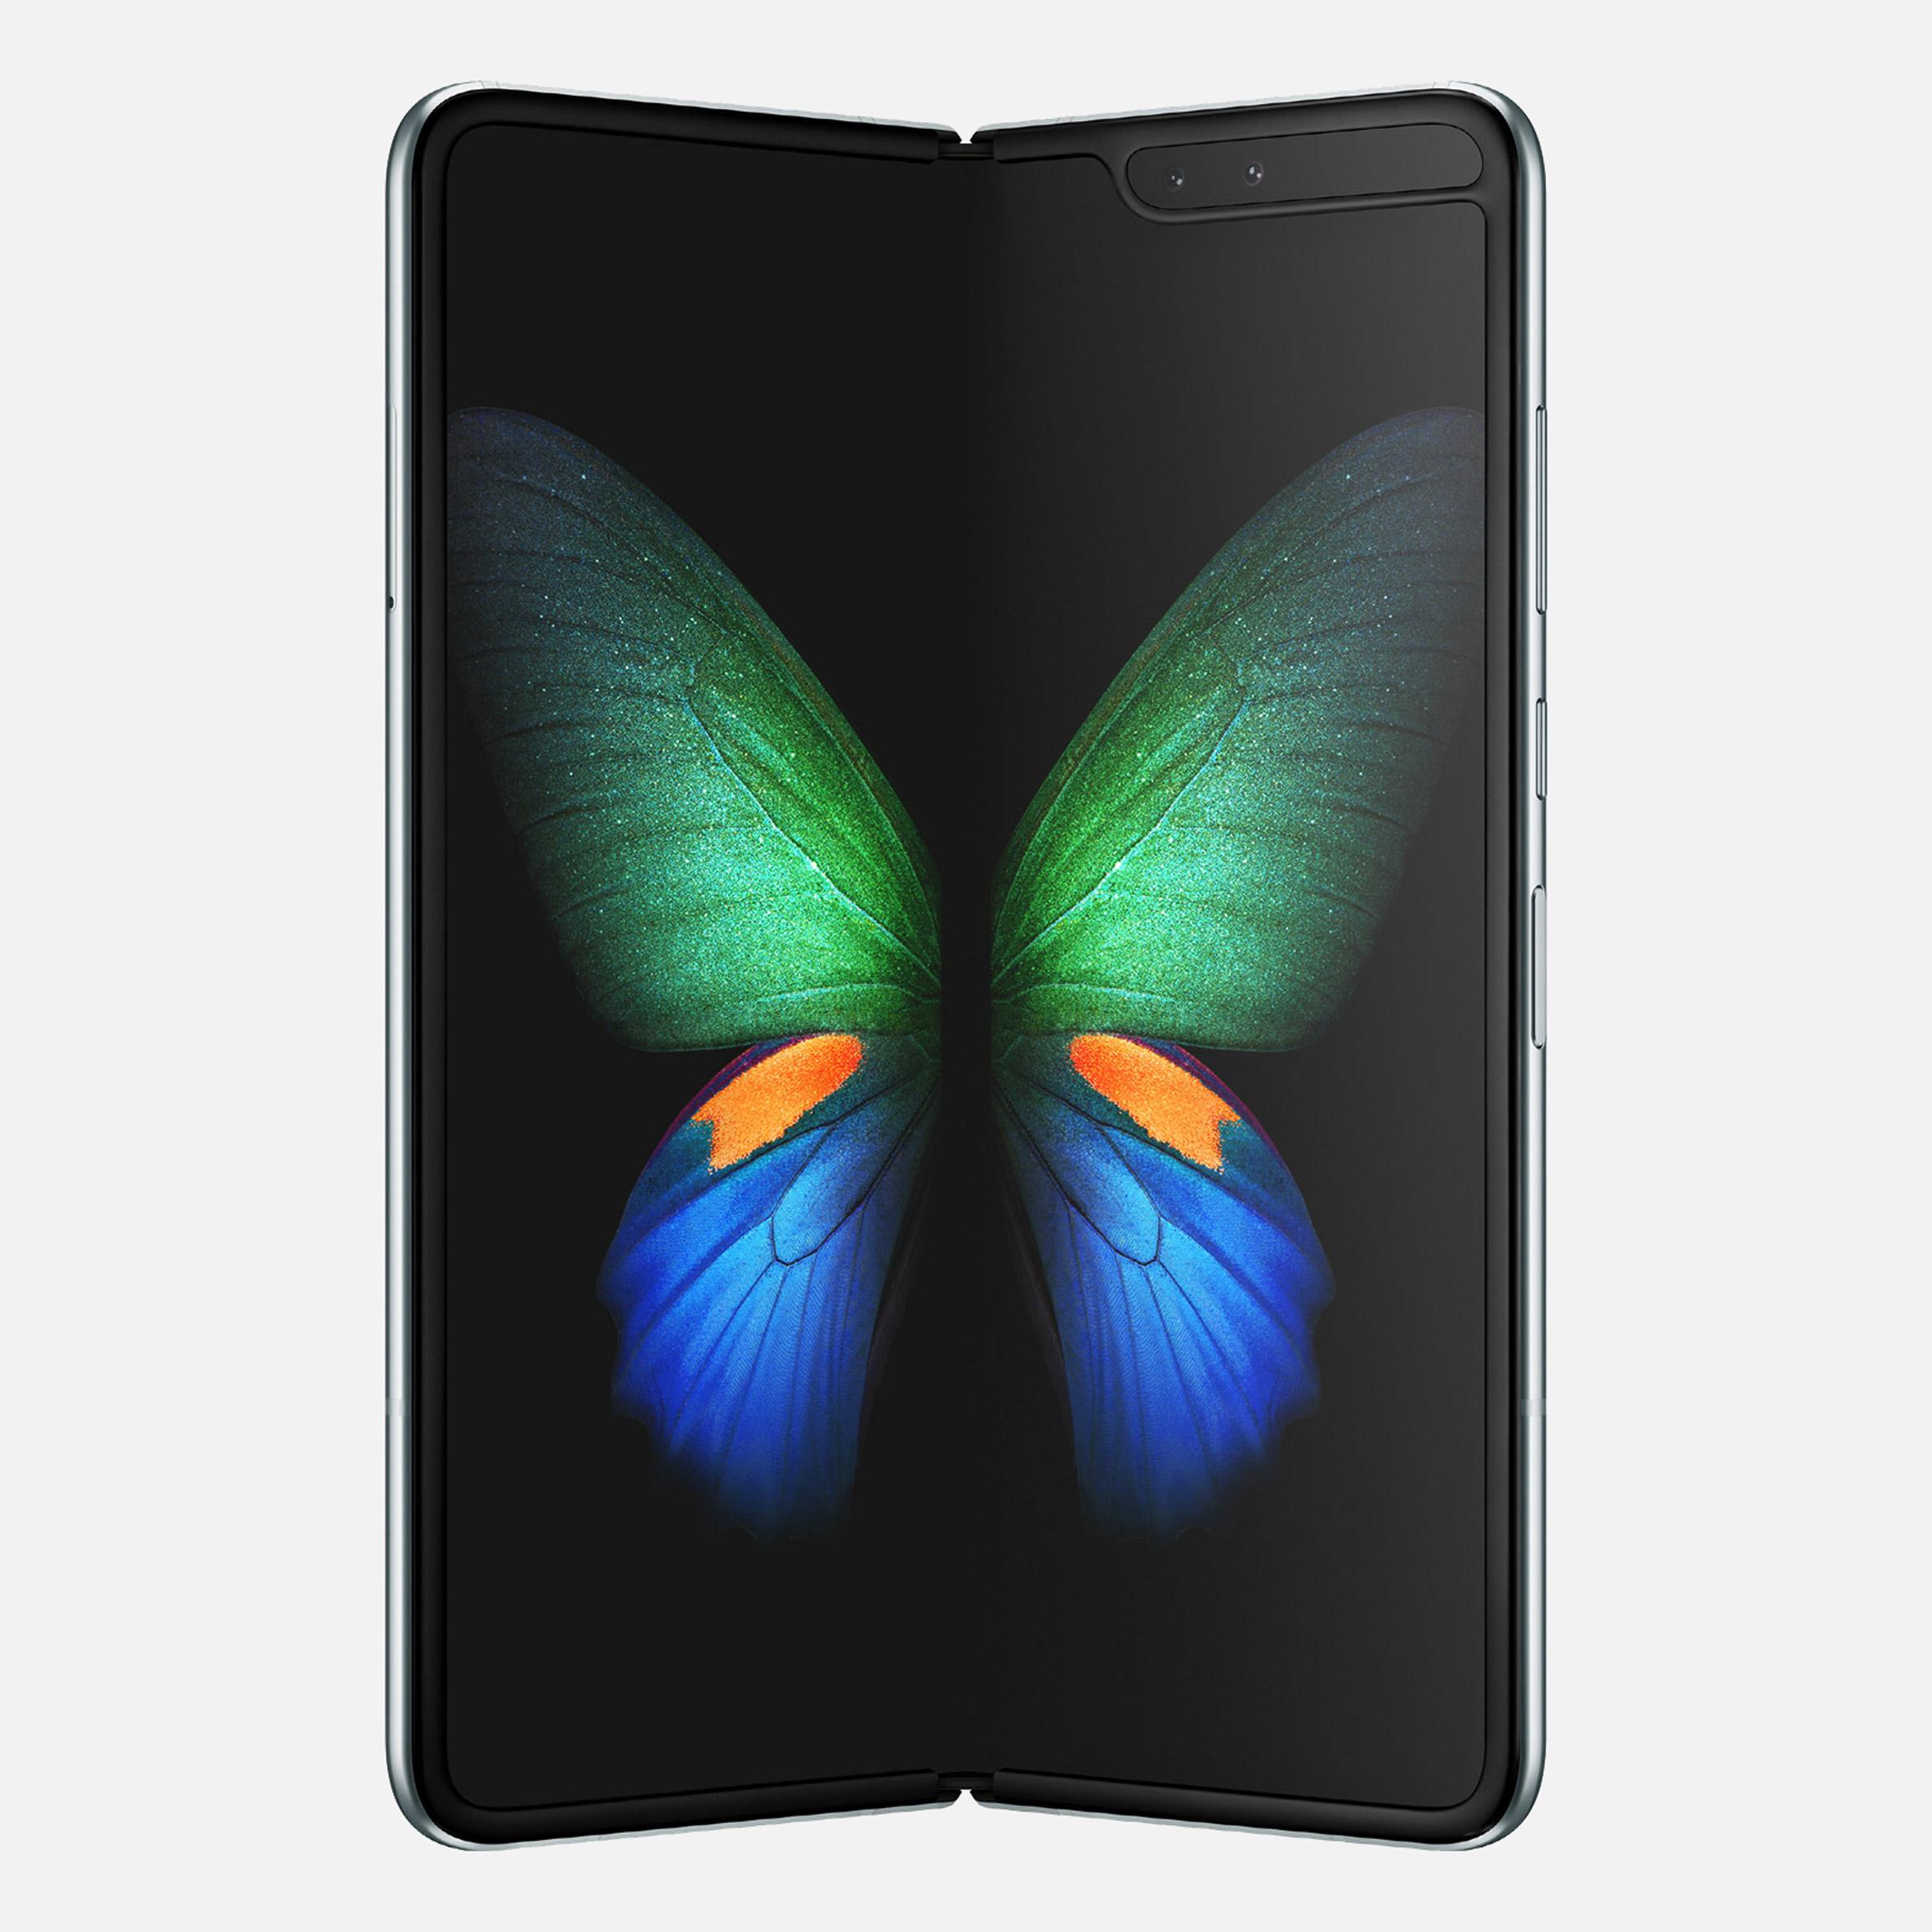 Samsung foldable smartphone: Galaxy Fold